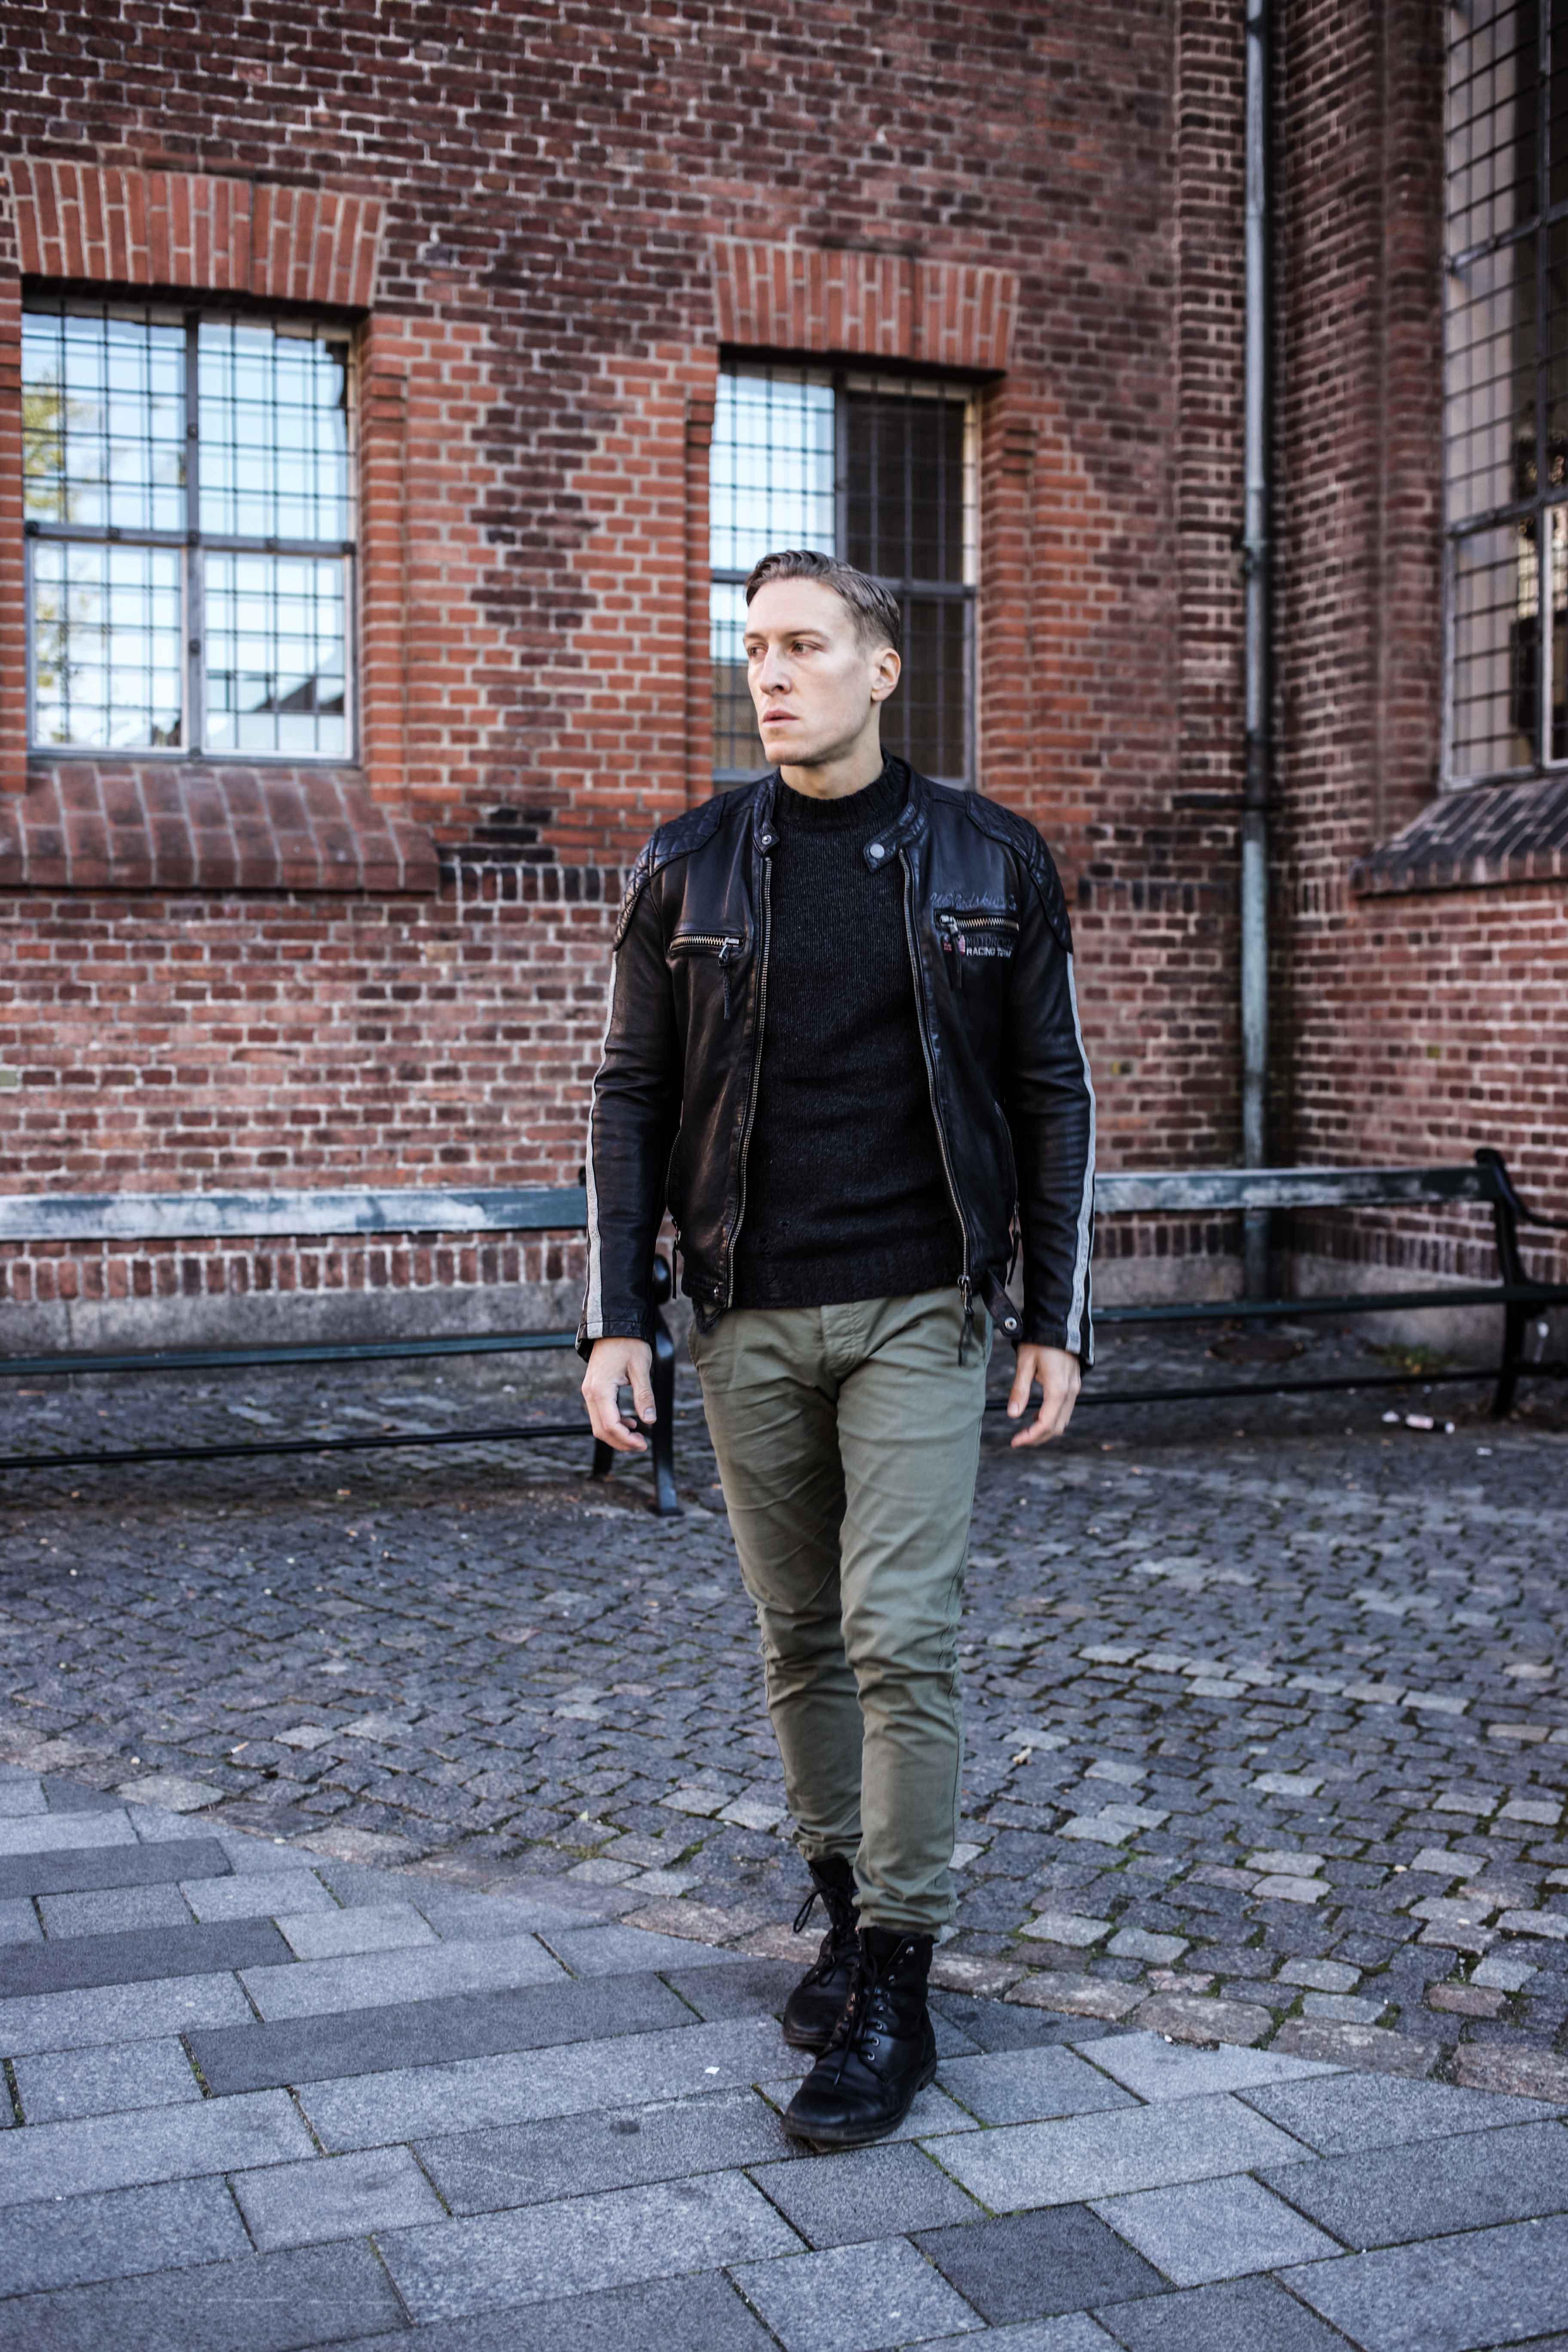 trashed-pullover-schwarze-lederjacke-olivgruene-chino-grunge-look_6015